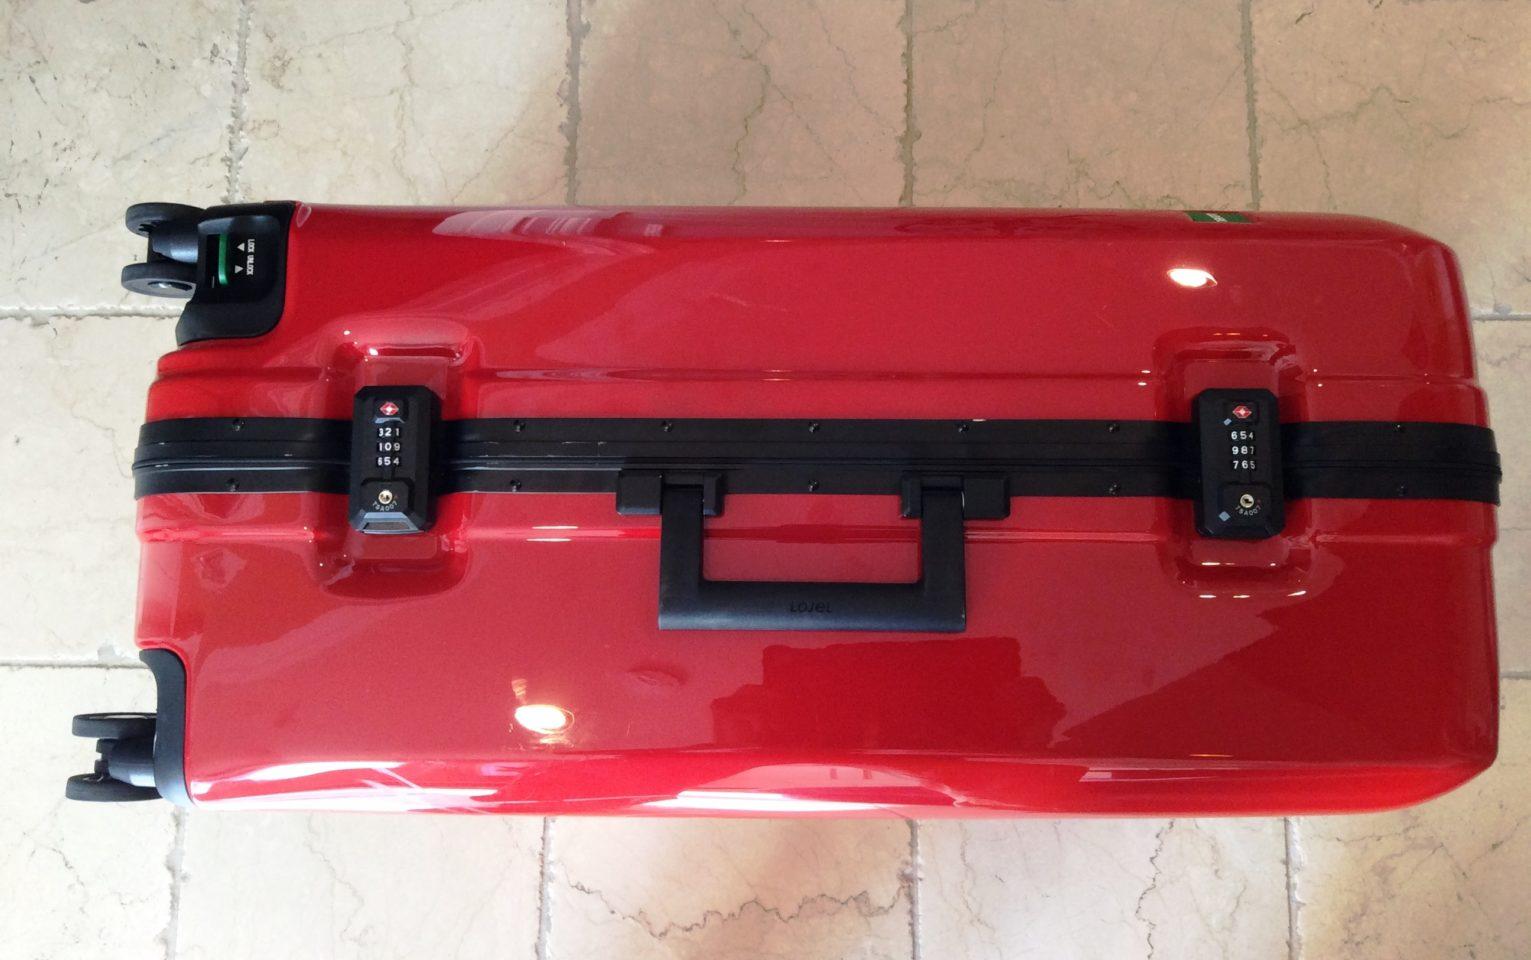 Lojel Luggage ~ Two TSA combination locks on the Novigo suitcase